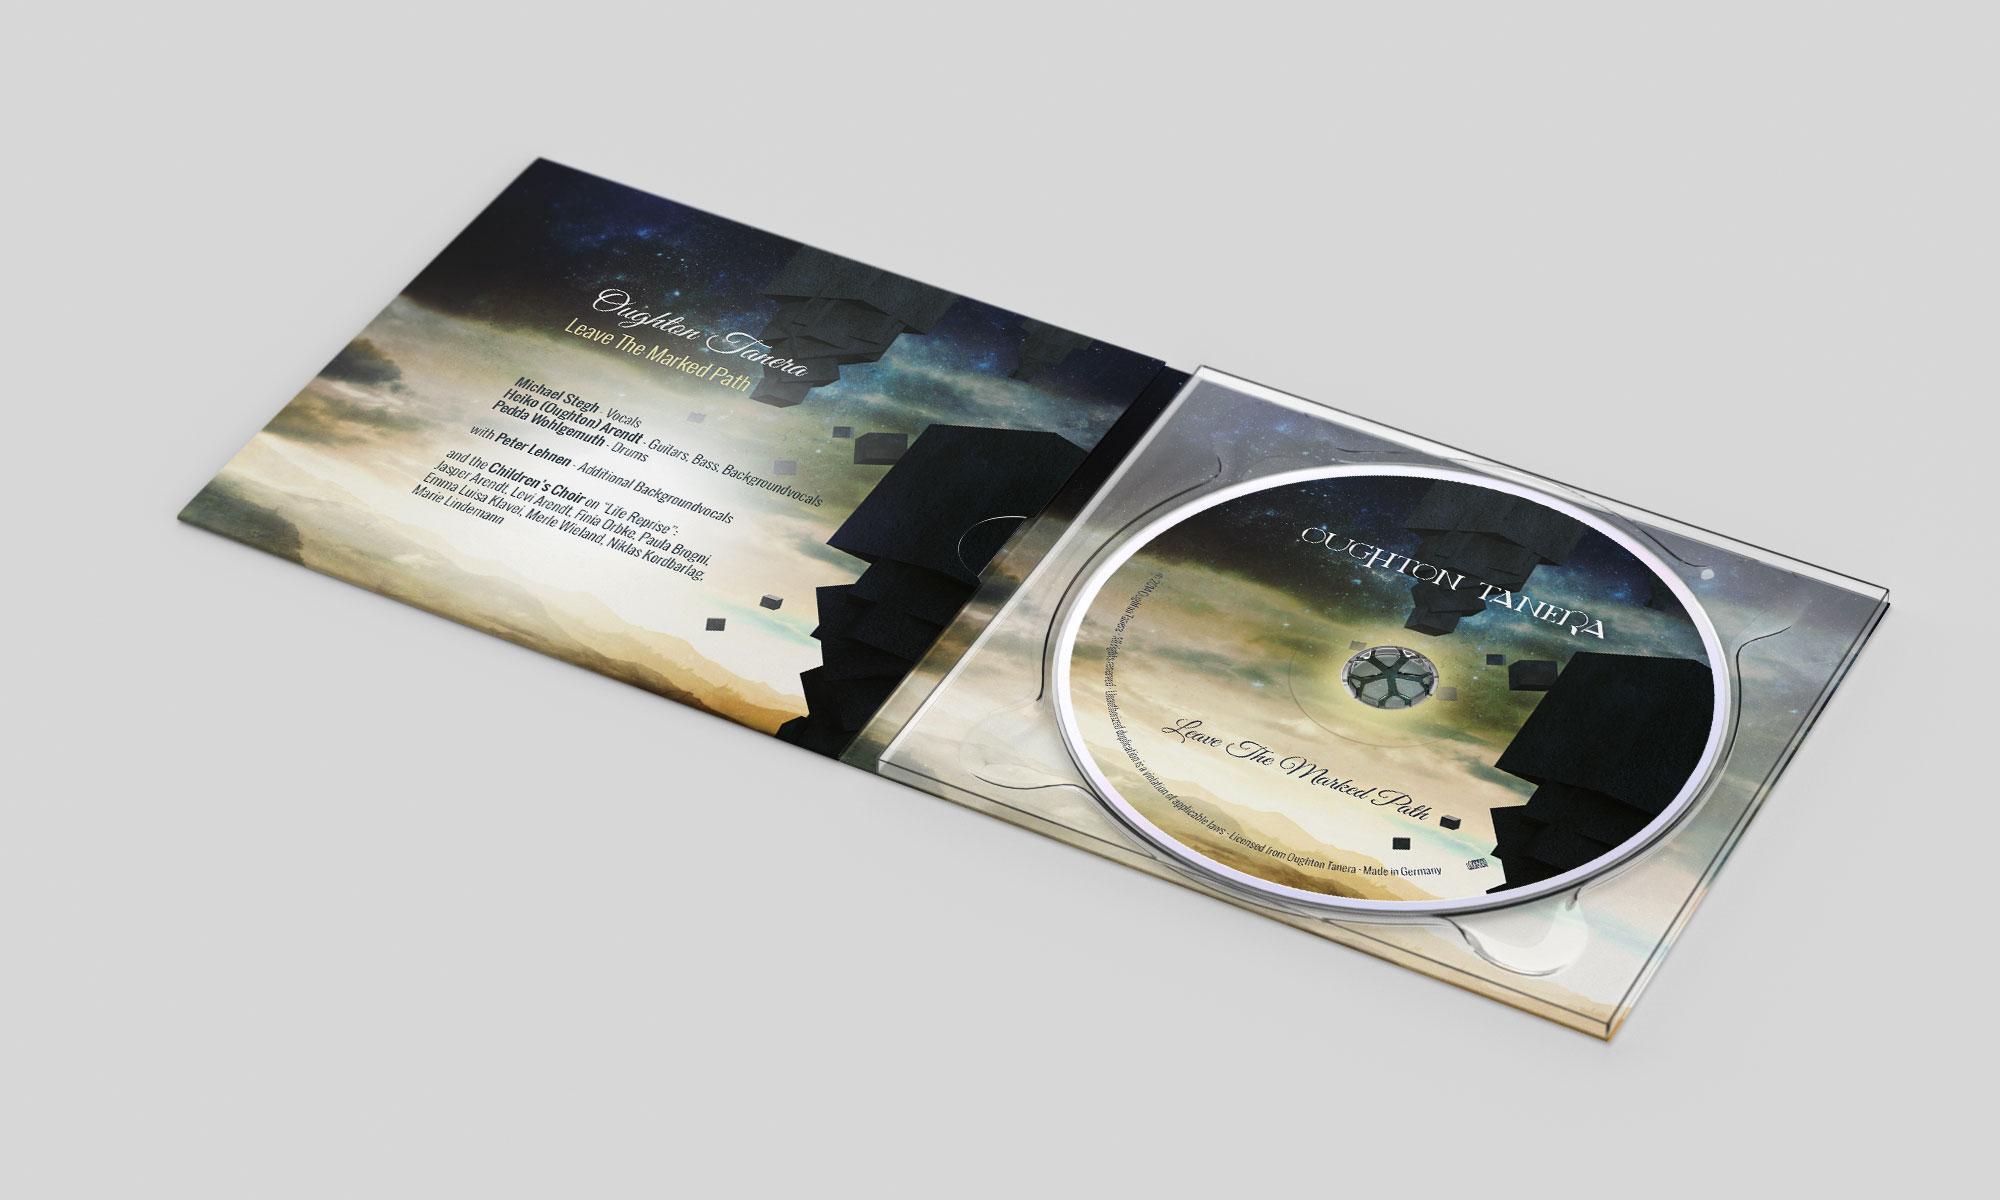 Oughton Tanera - CD Digipak